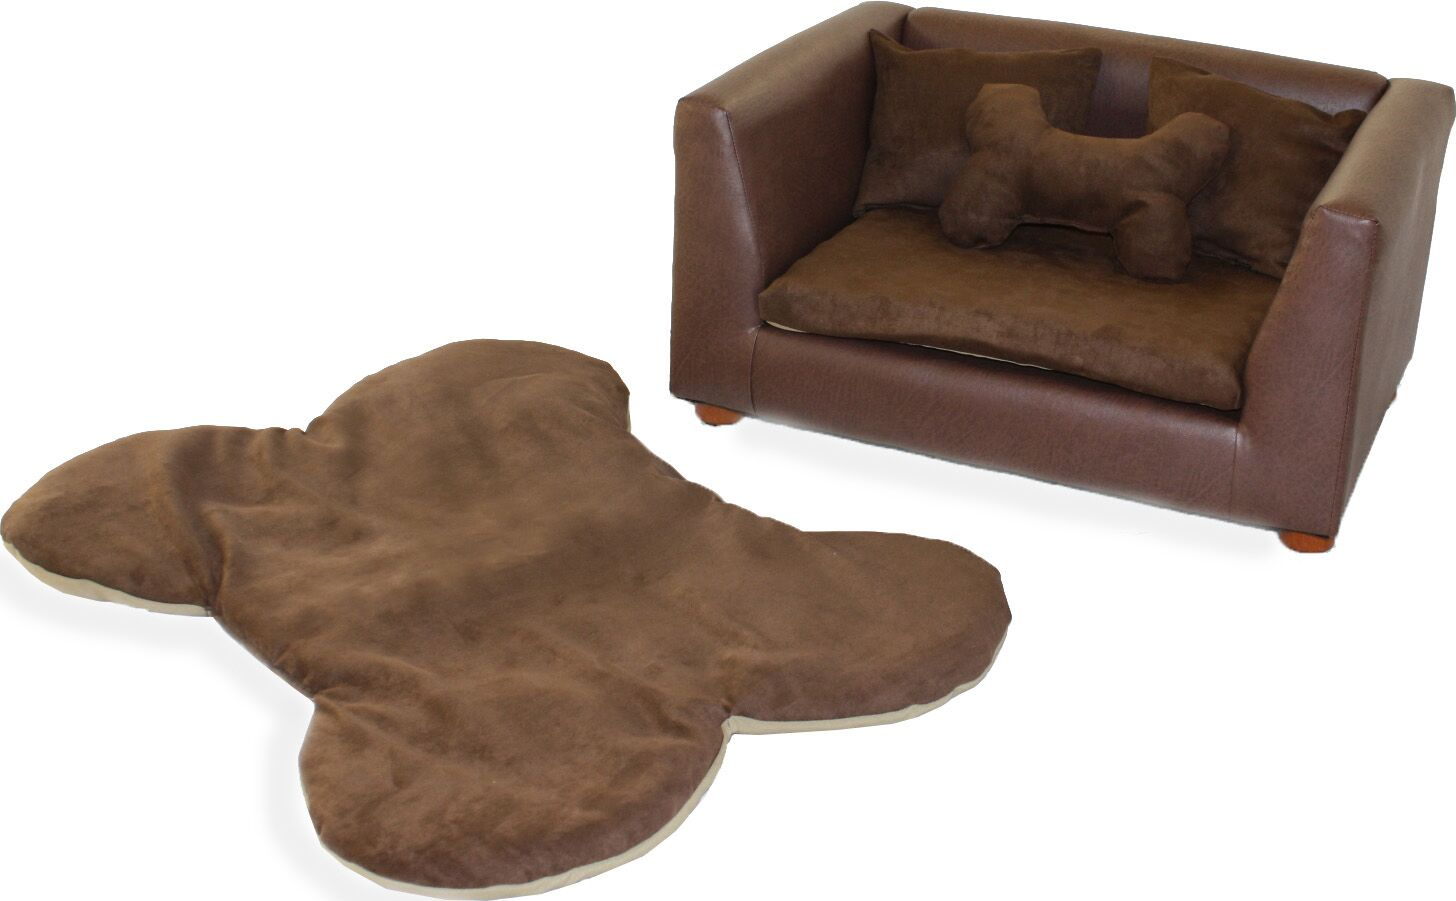 Ozzie Orthopedic Memory Foam Dog Chair Set Color: Brown, Size: Medium (28